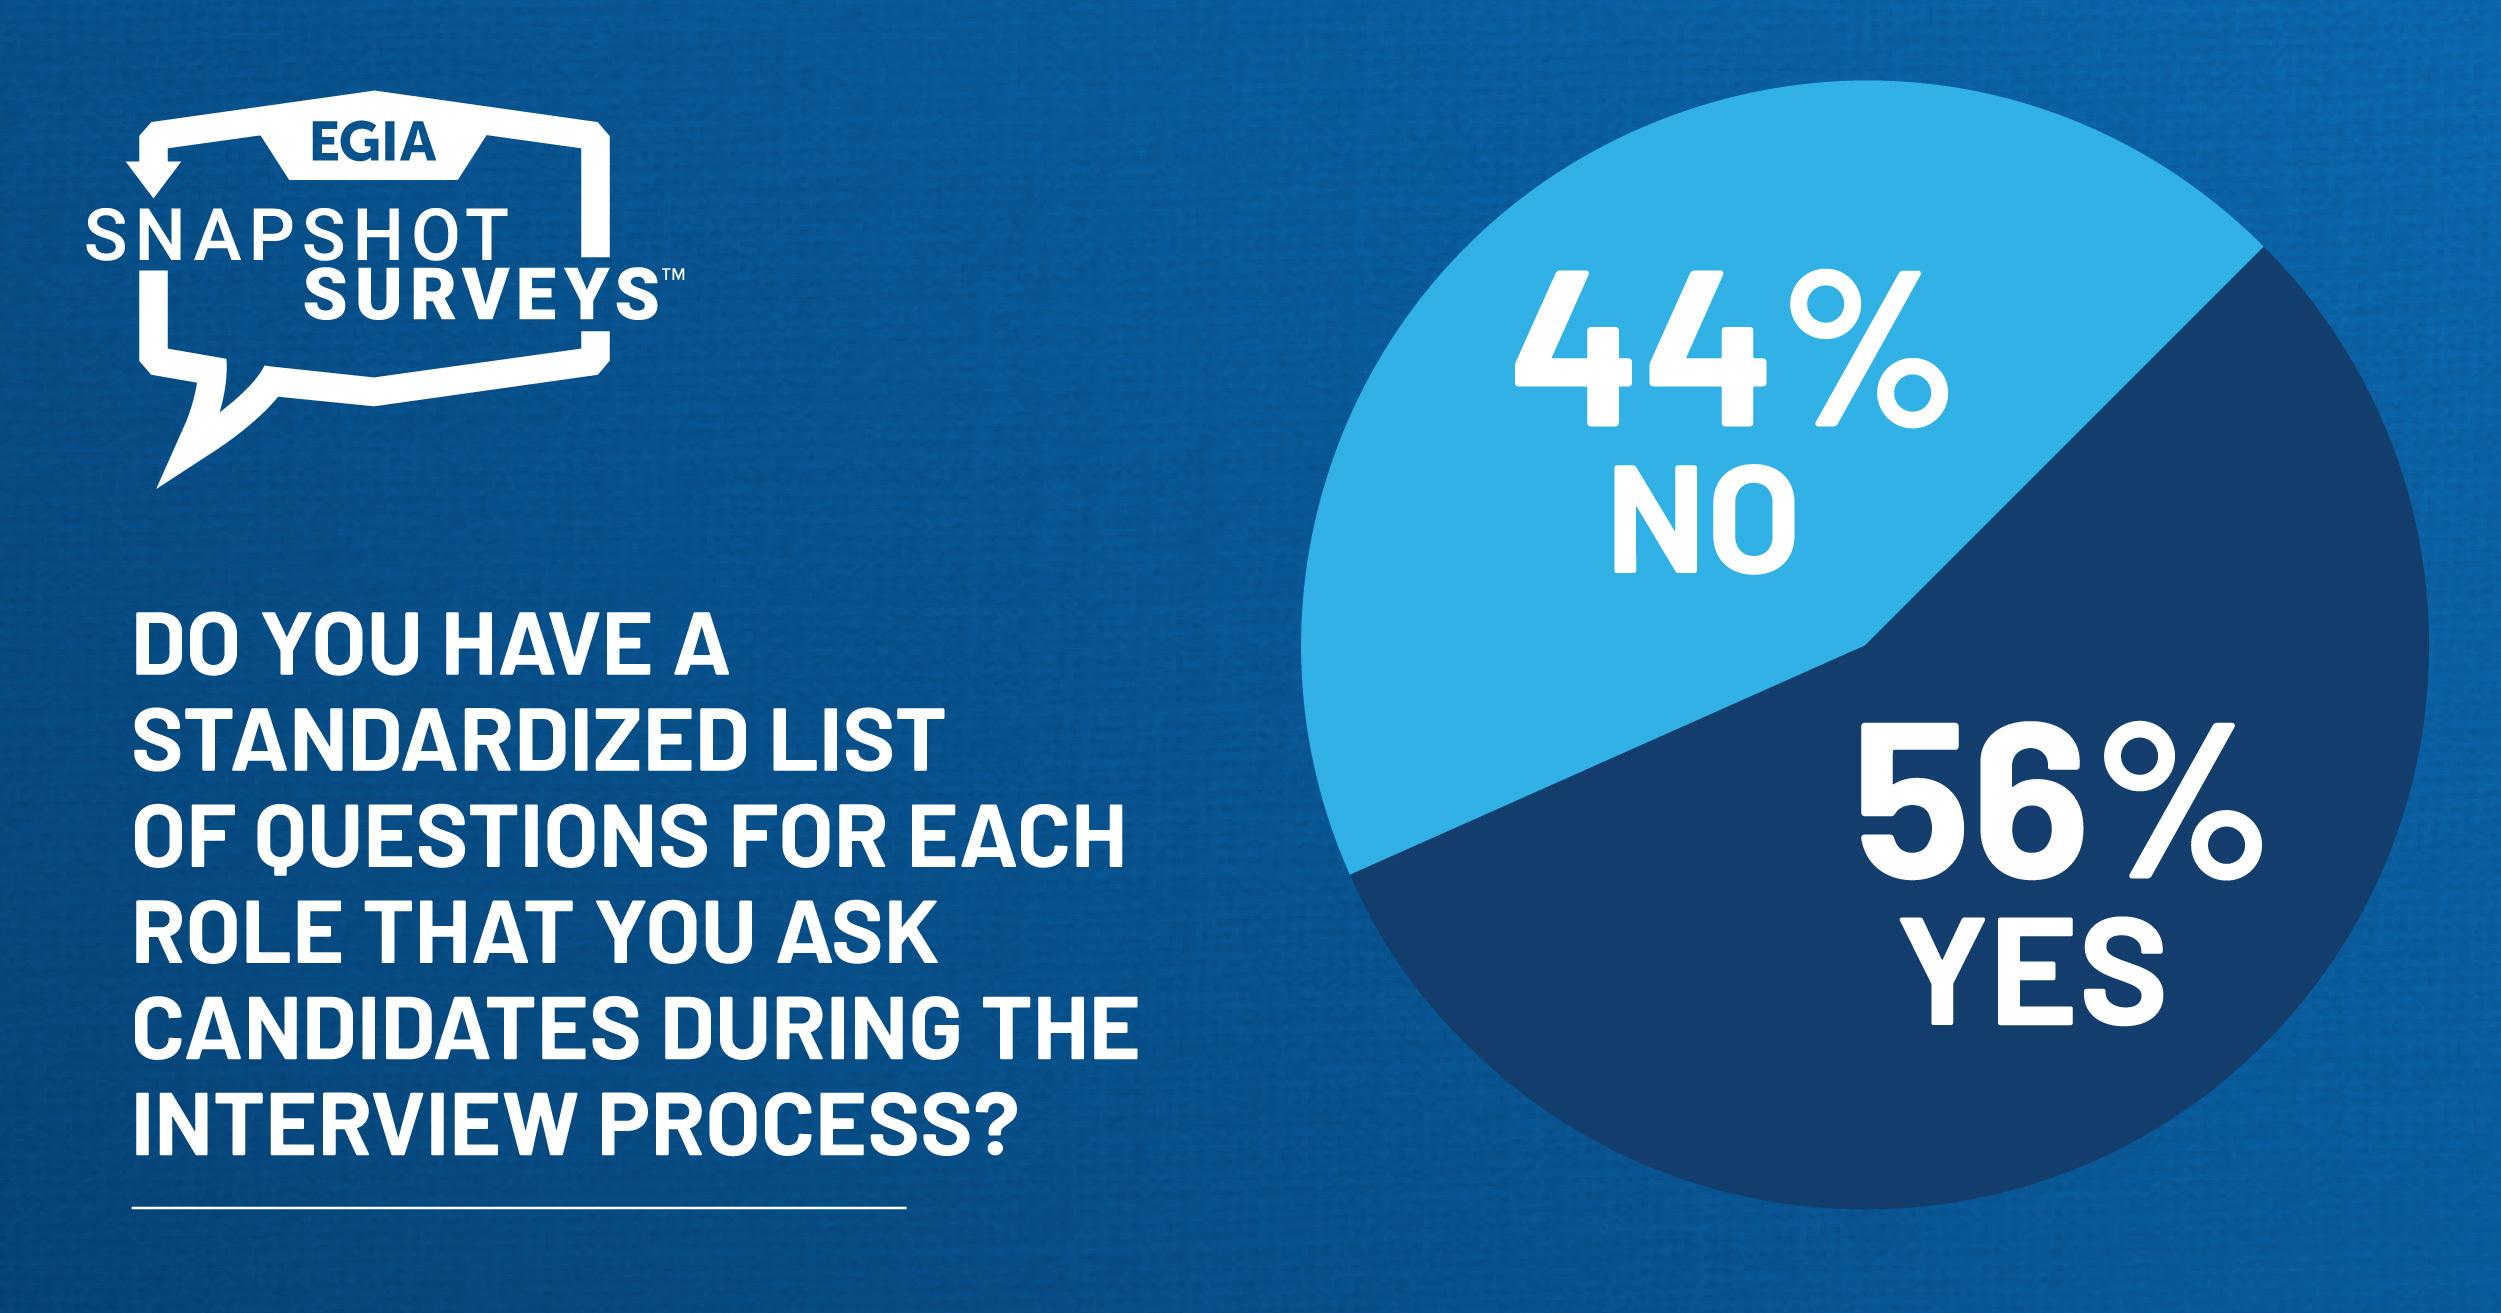 EGIA Snapshot Survey - The Interview Process